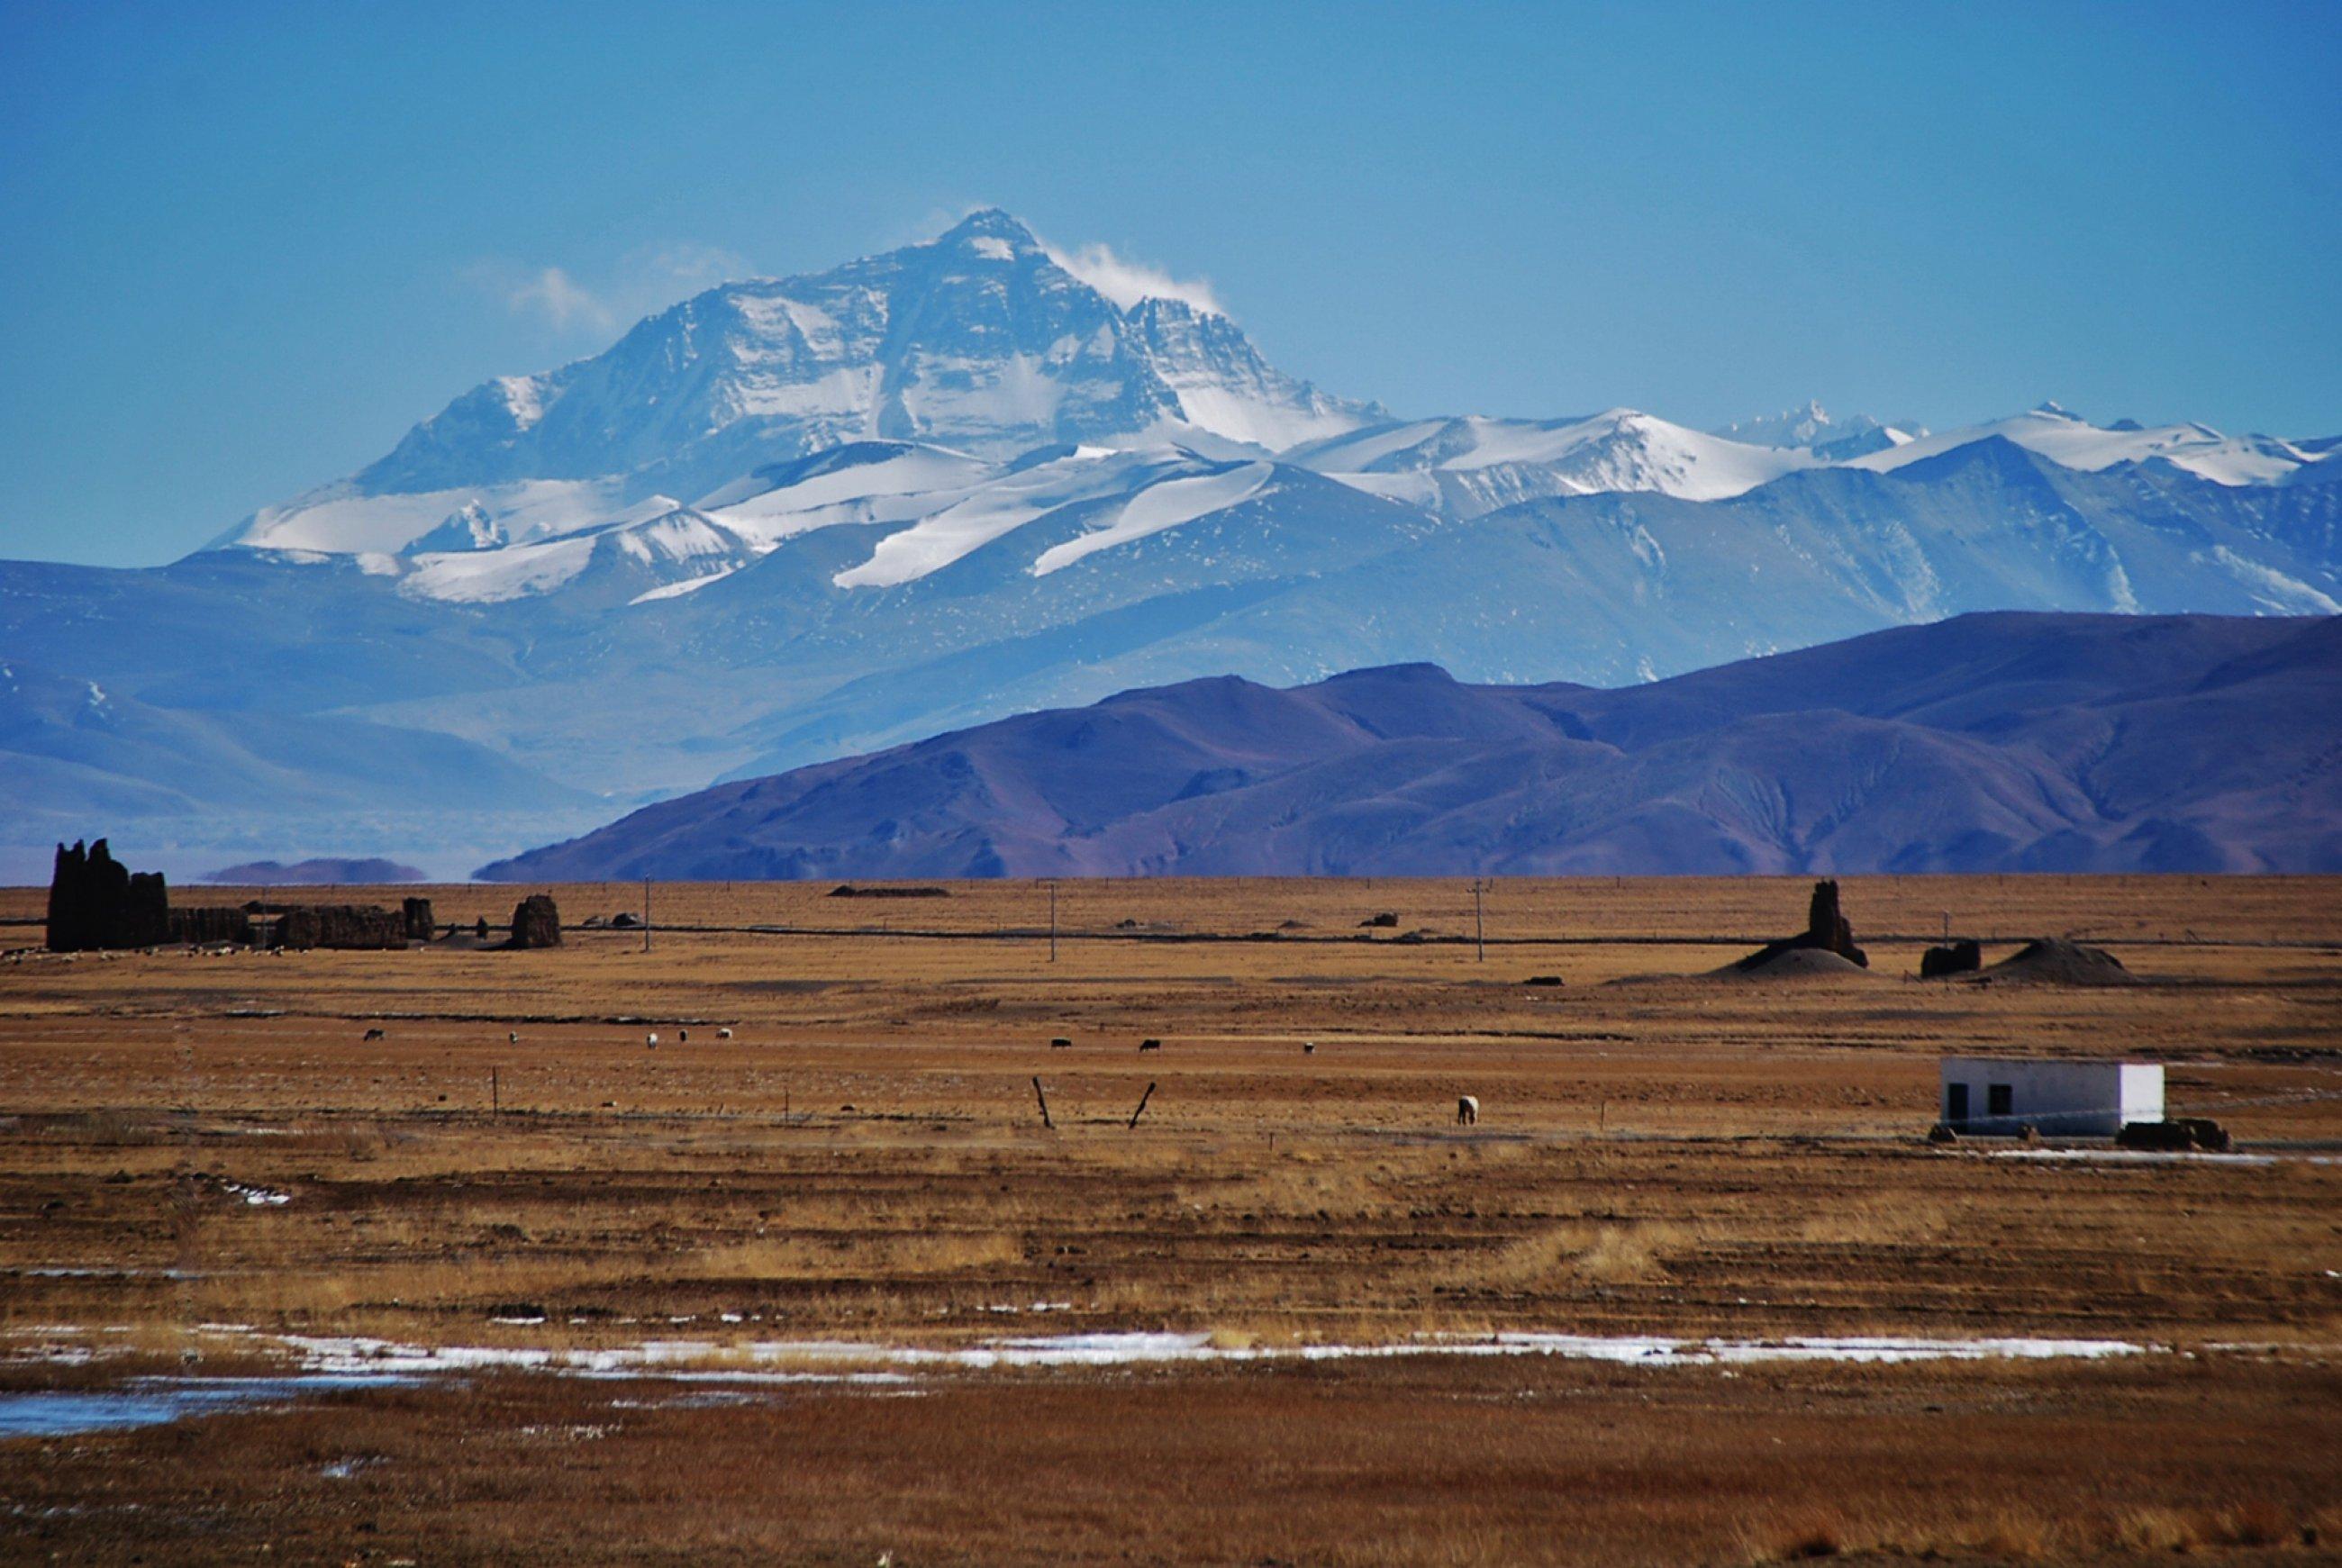 https://bubo.sk/uploads/galleries/16319/tibet-himalaje-11-2014-everest-mirka-sulka-299-.jpg